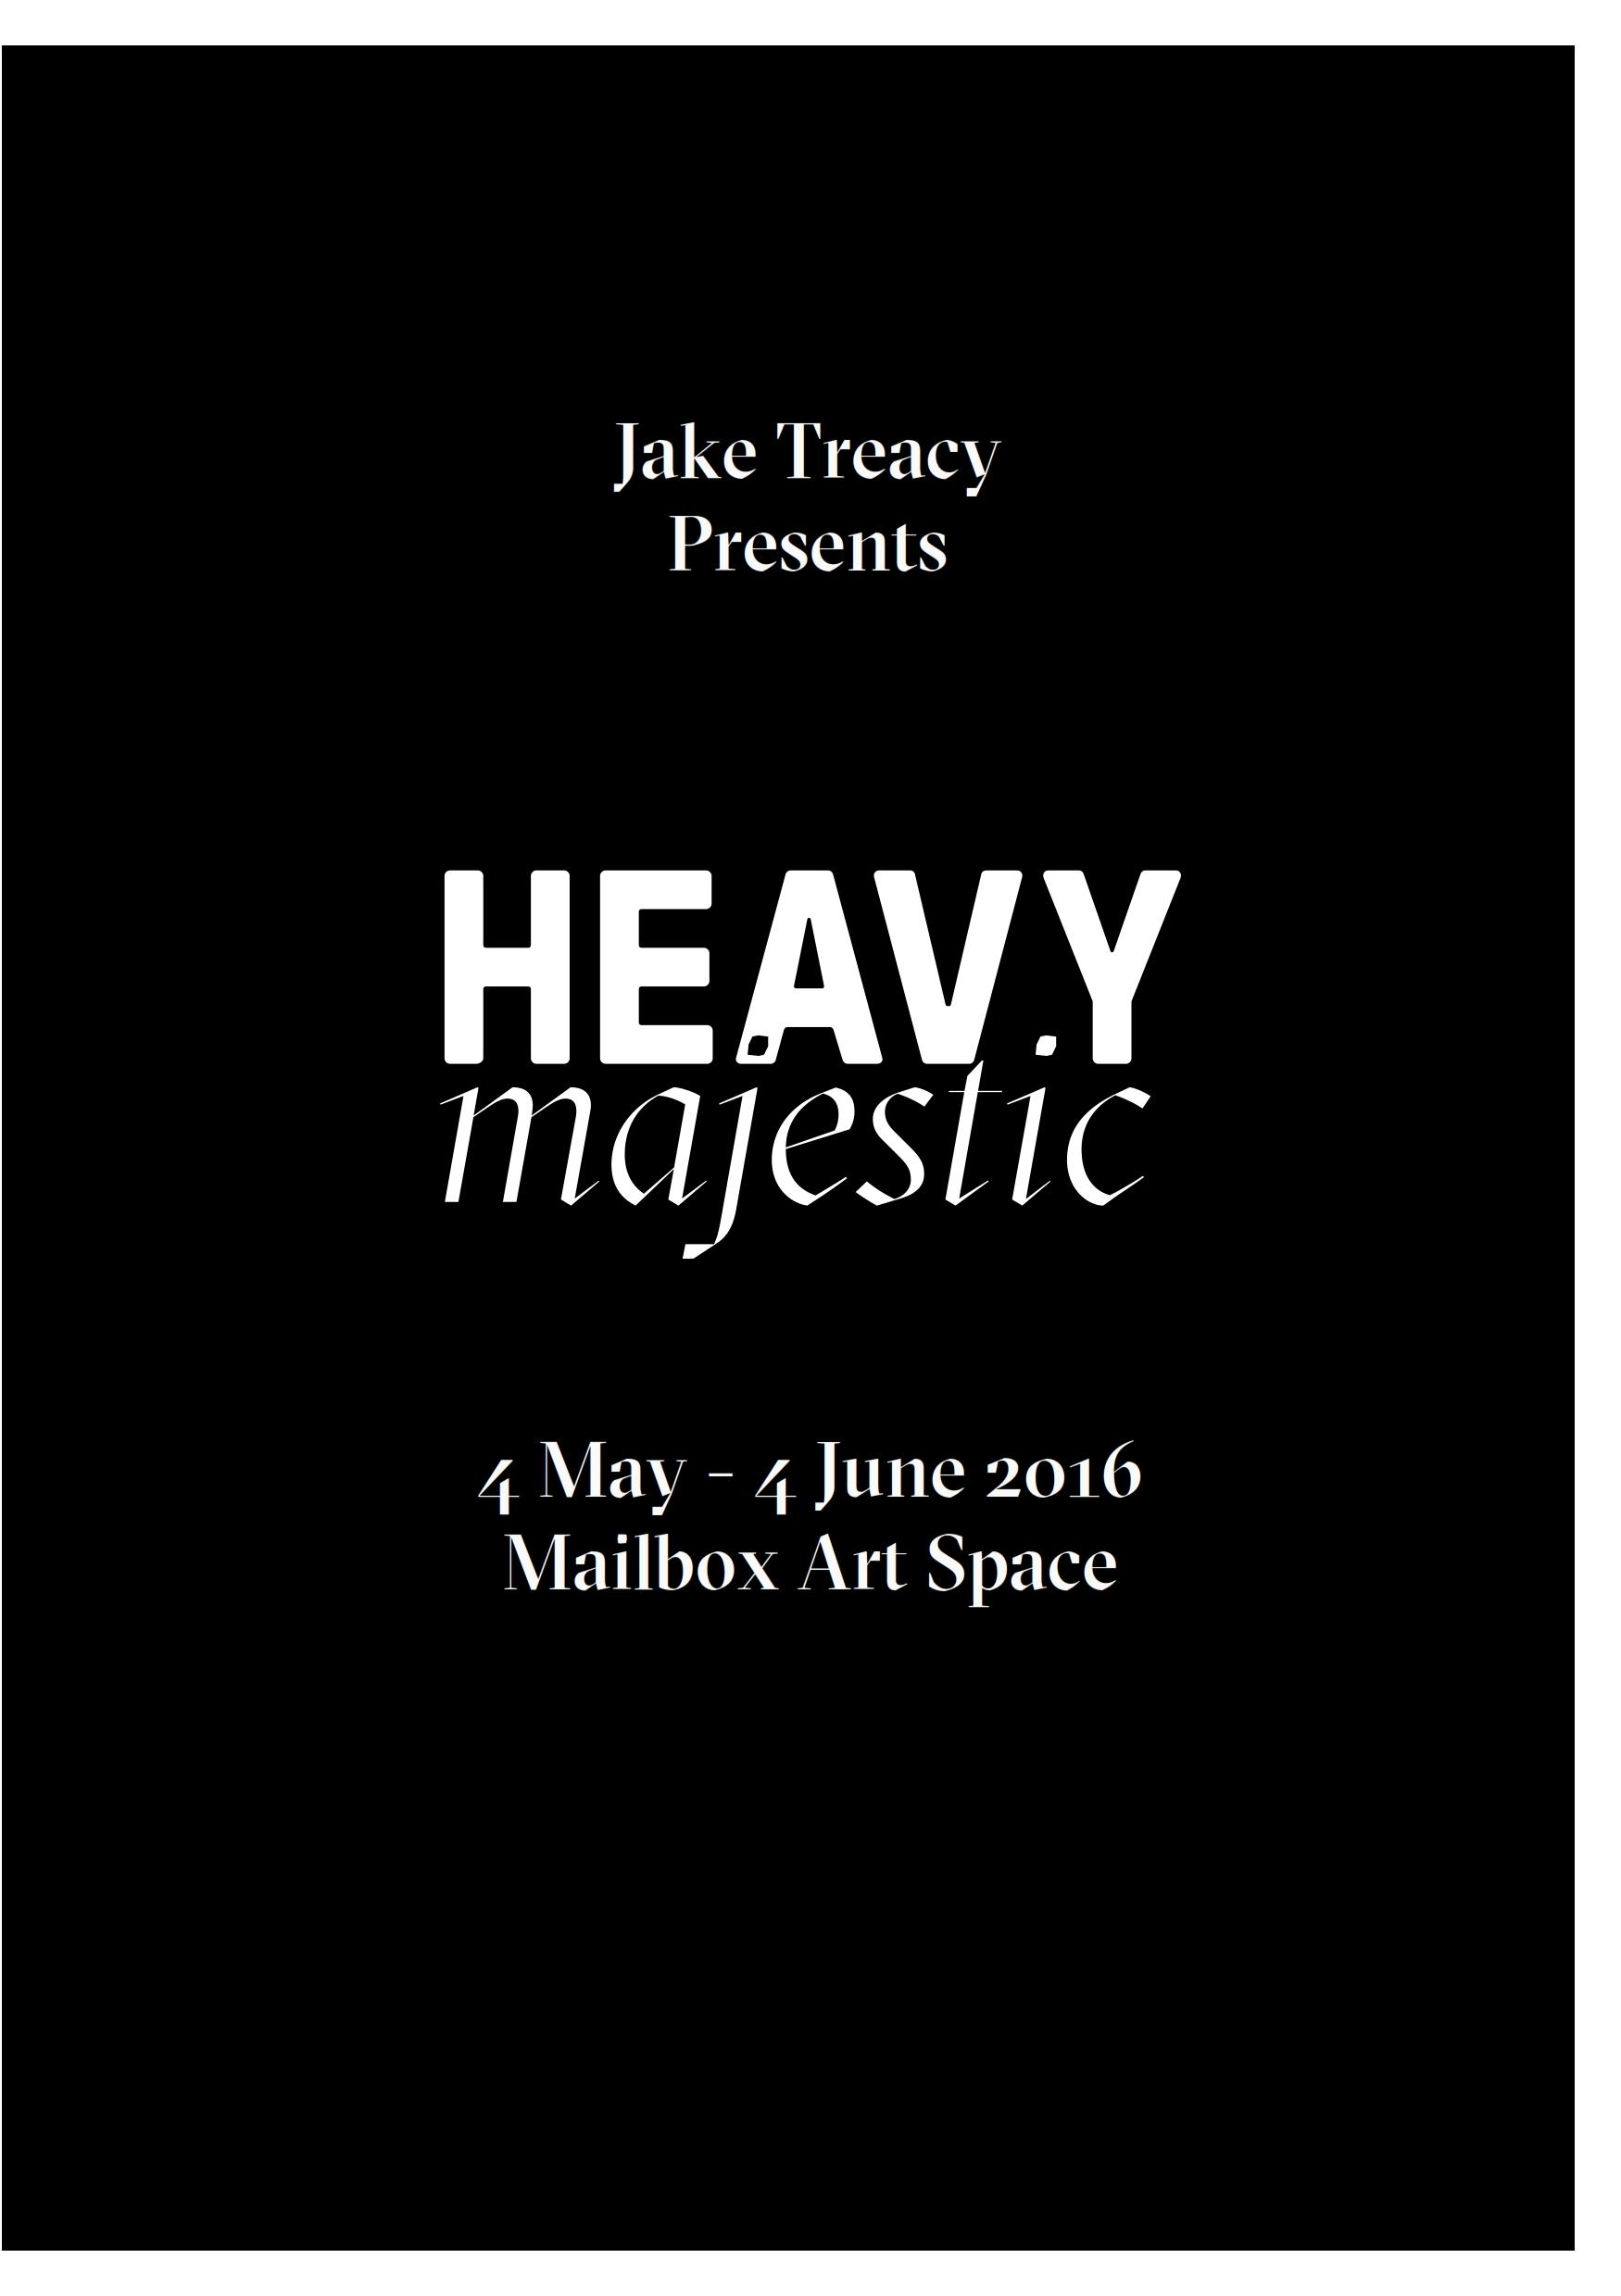 HeavyMajestic_Catalogue_digital_001.jpg